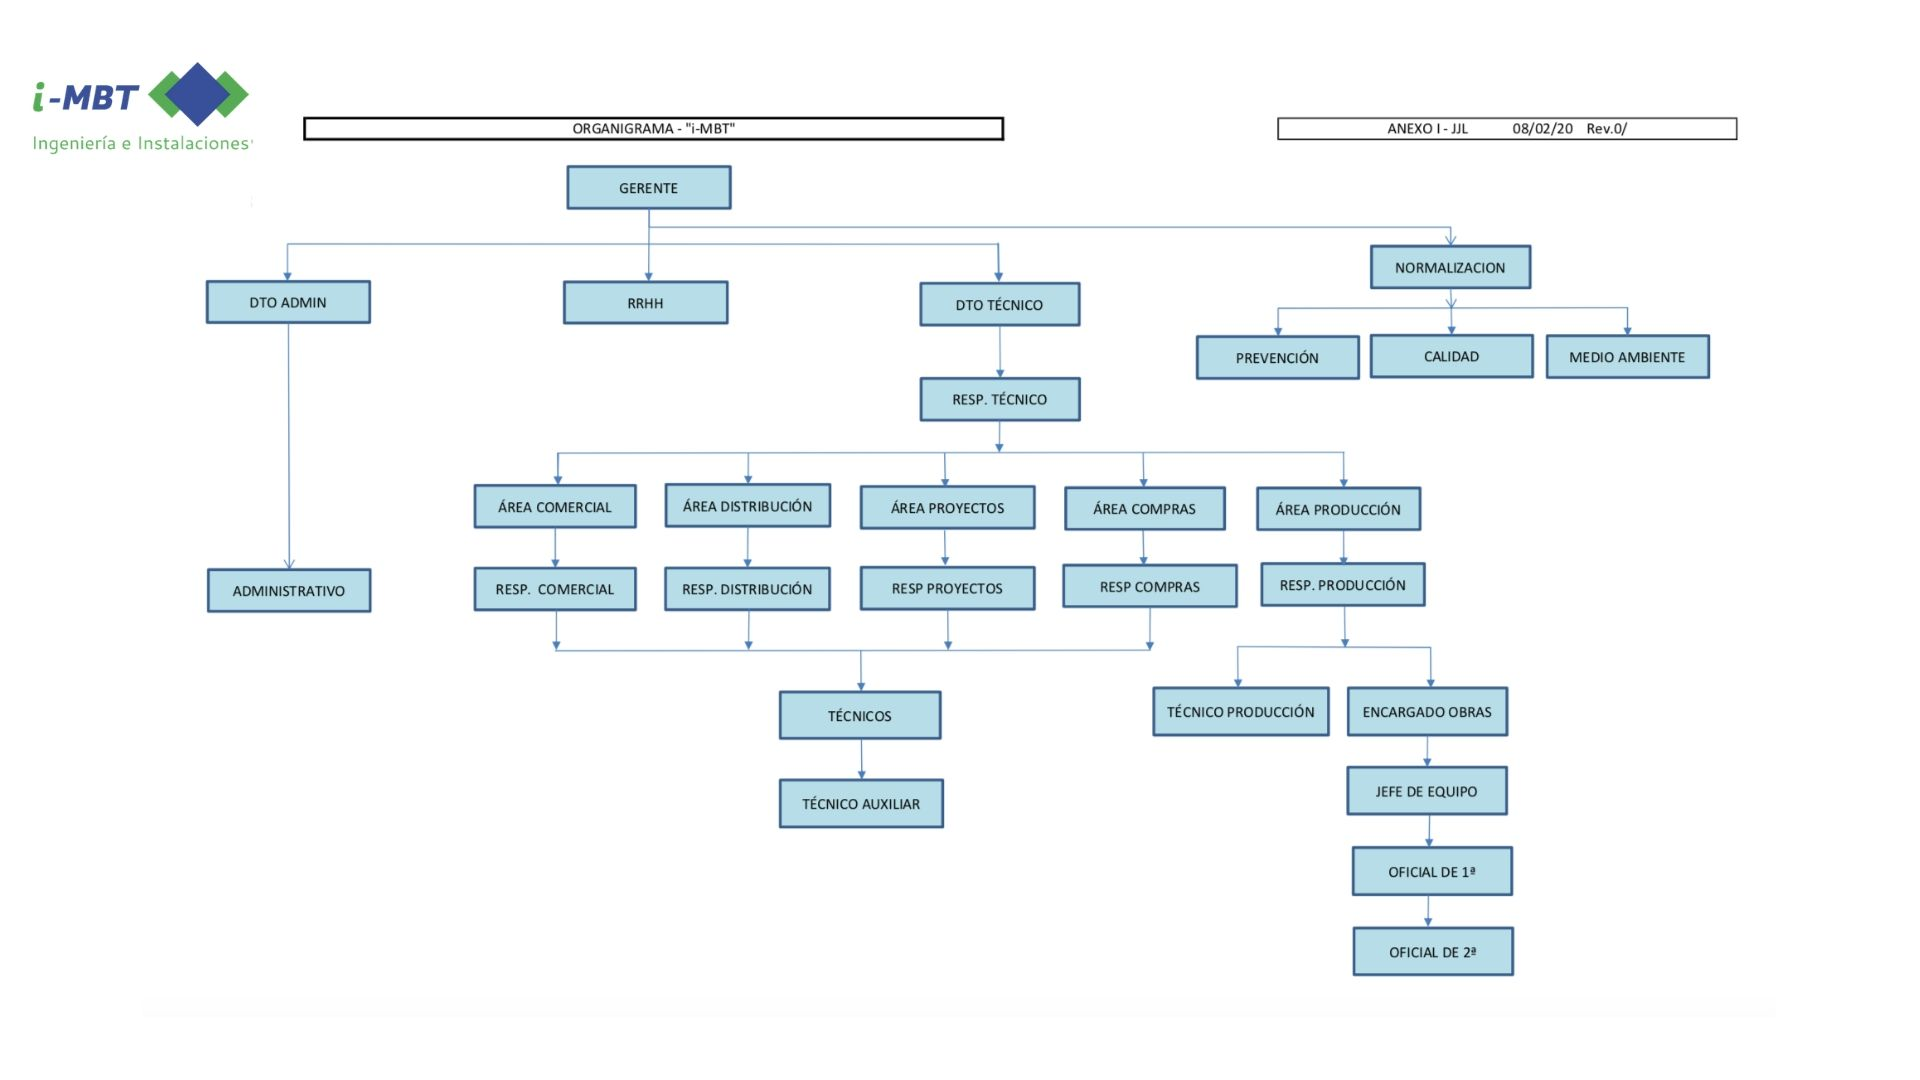 Organigrama i-mbt